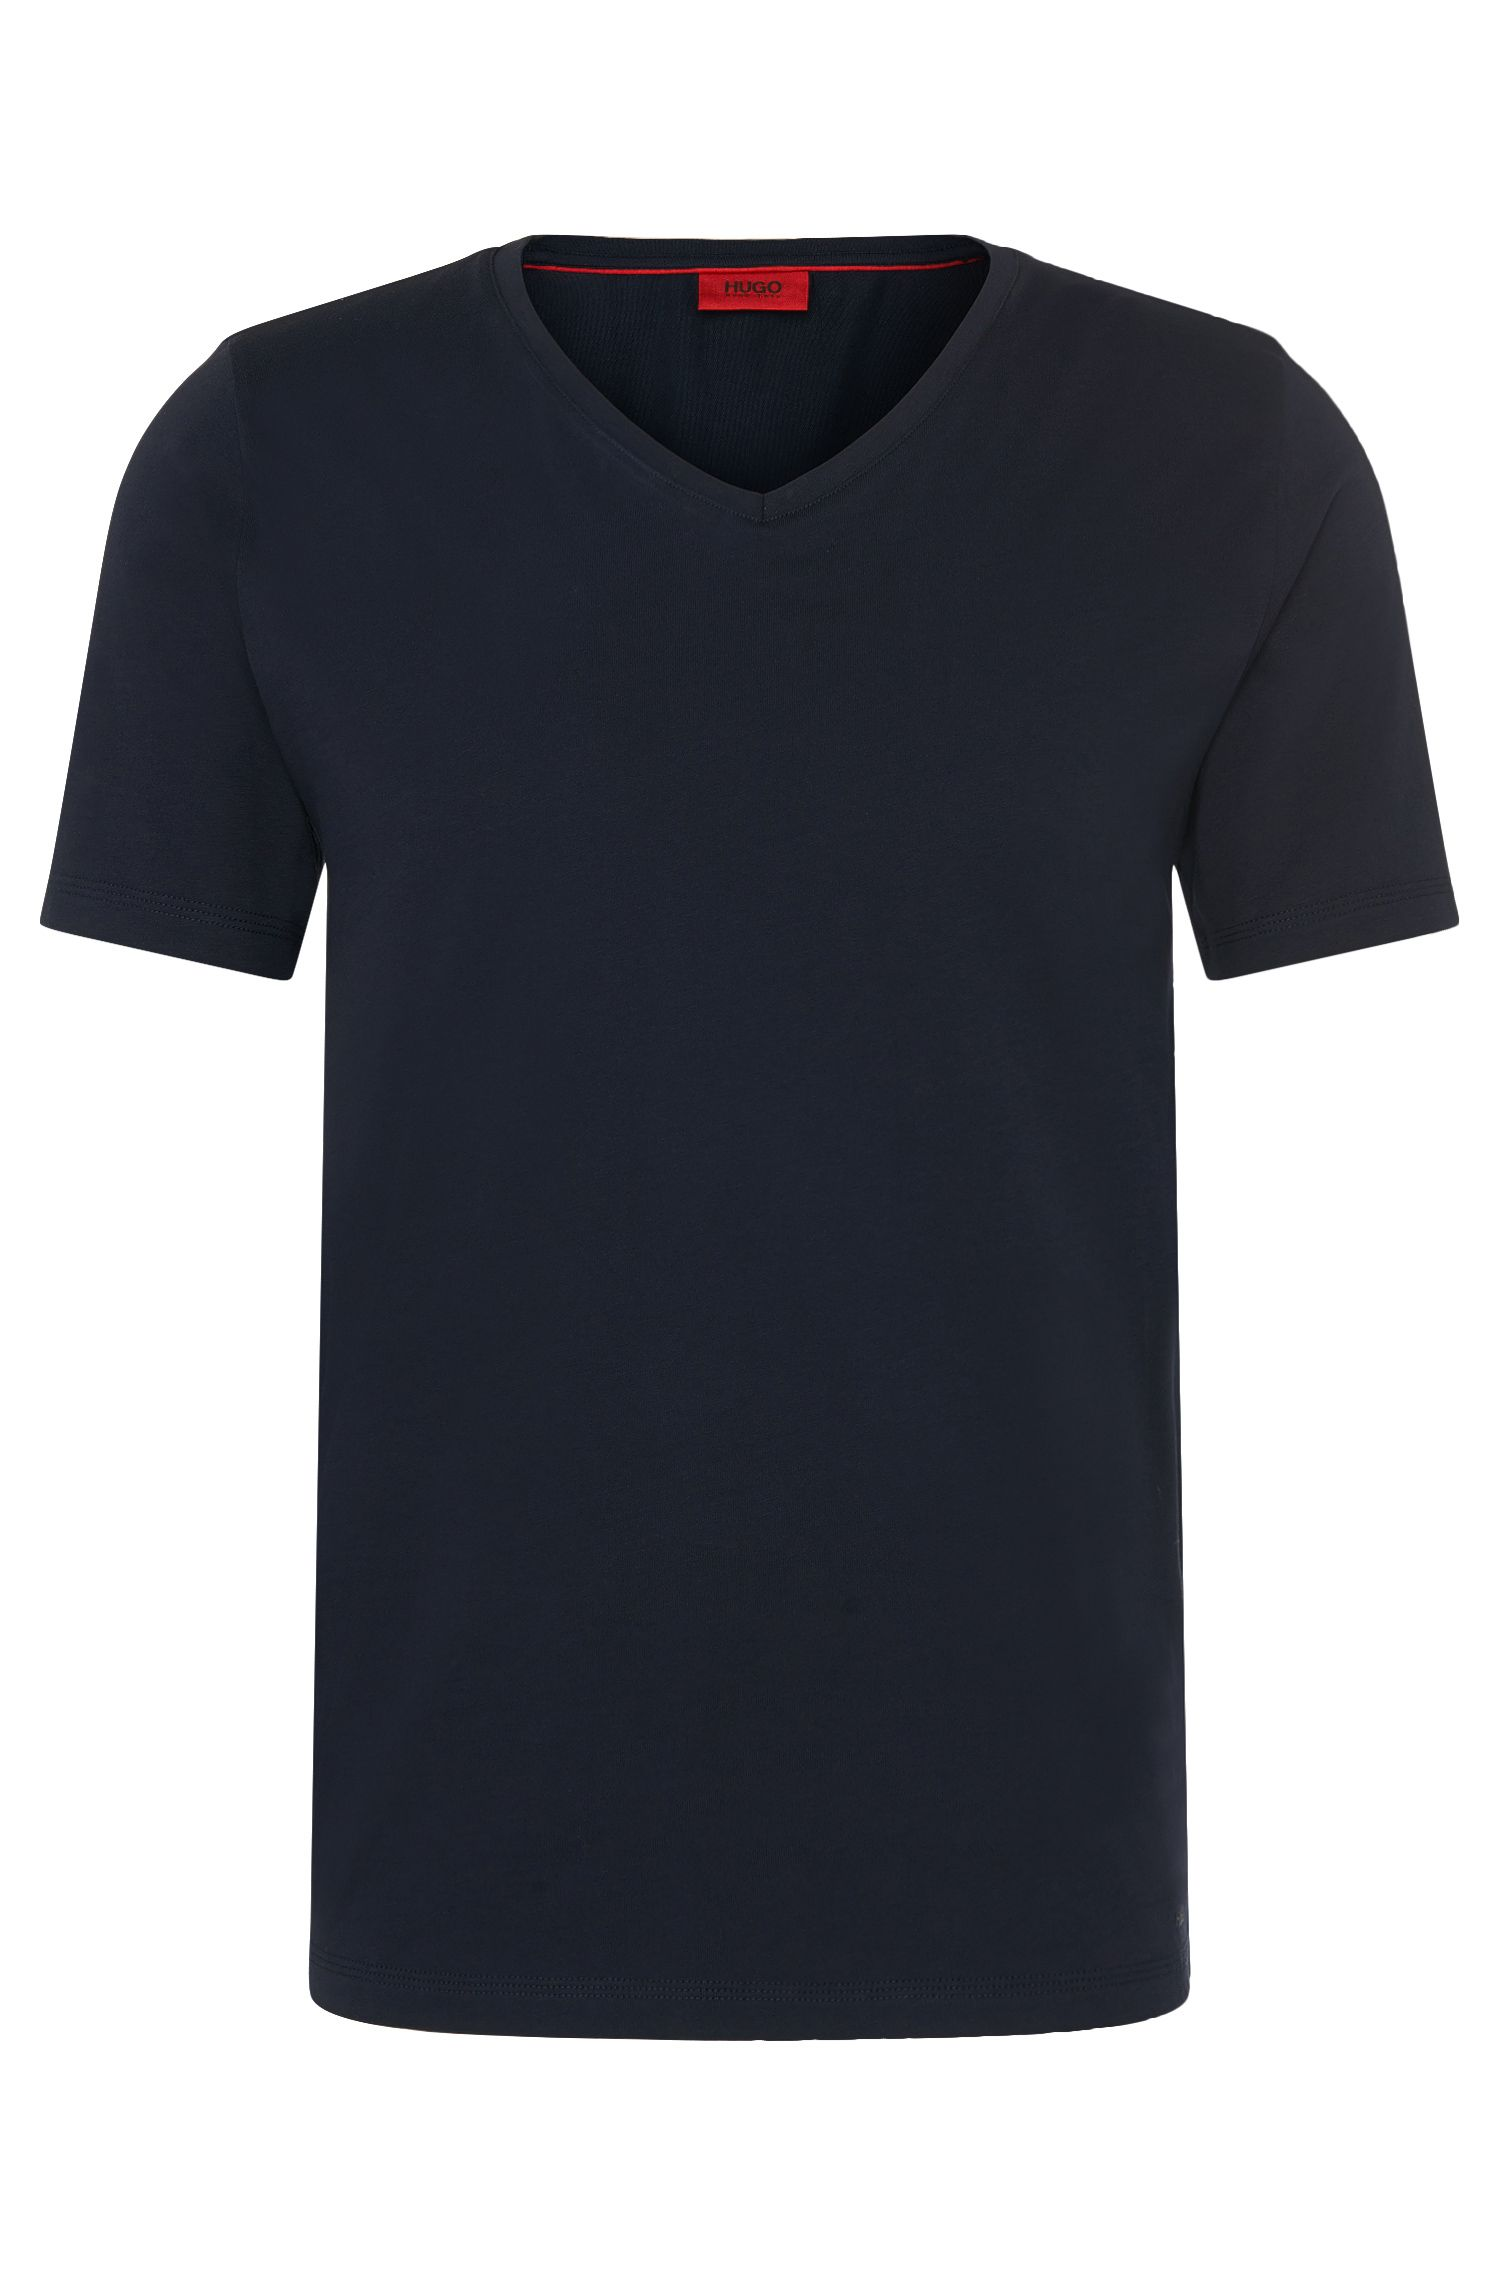 Unifarbenes Slim-Fit T-Shirt aus Baumwolle: 'Danny'